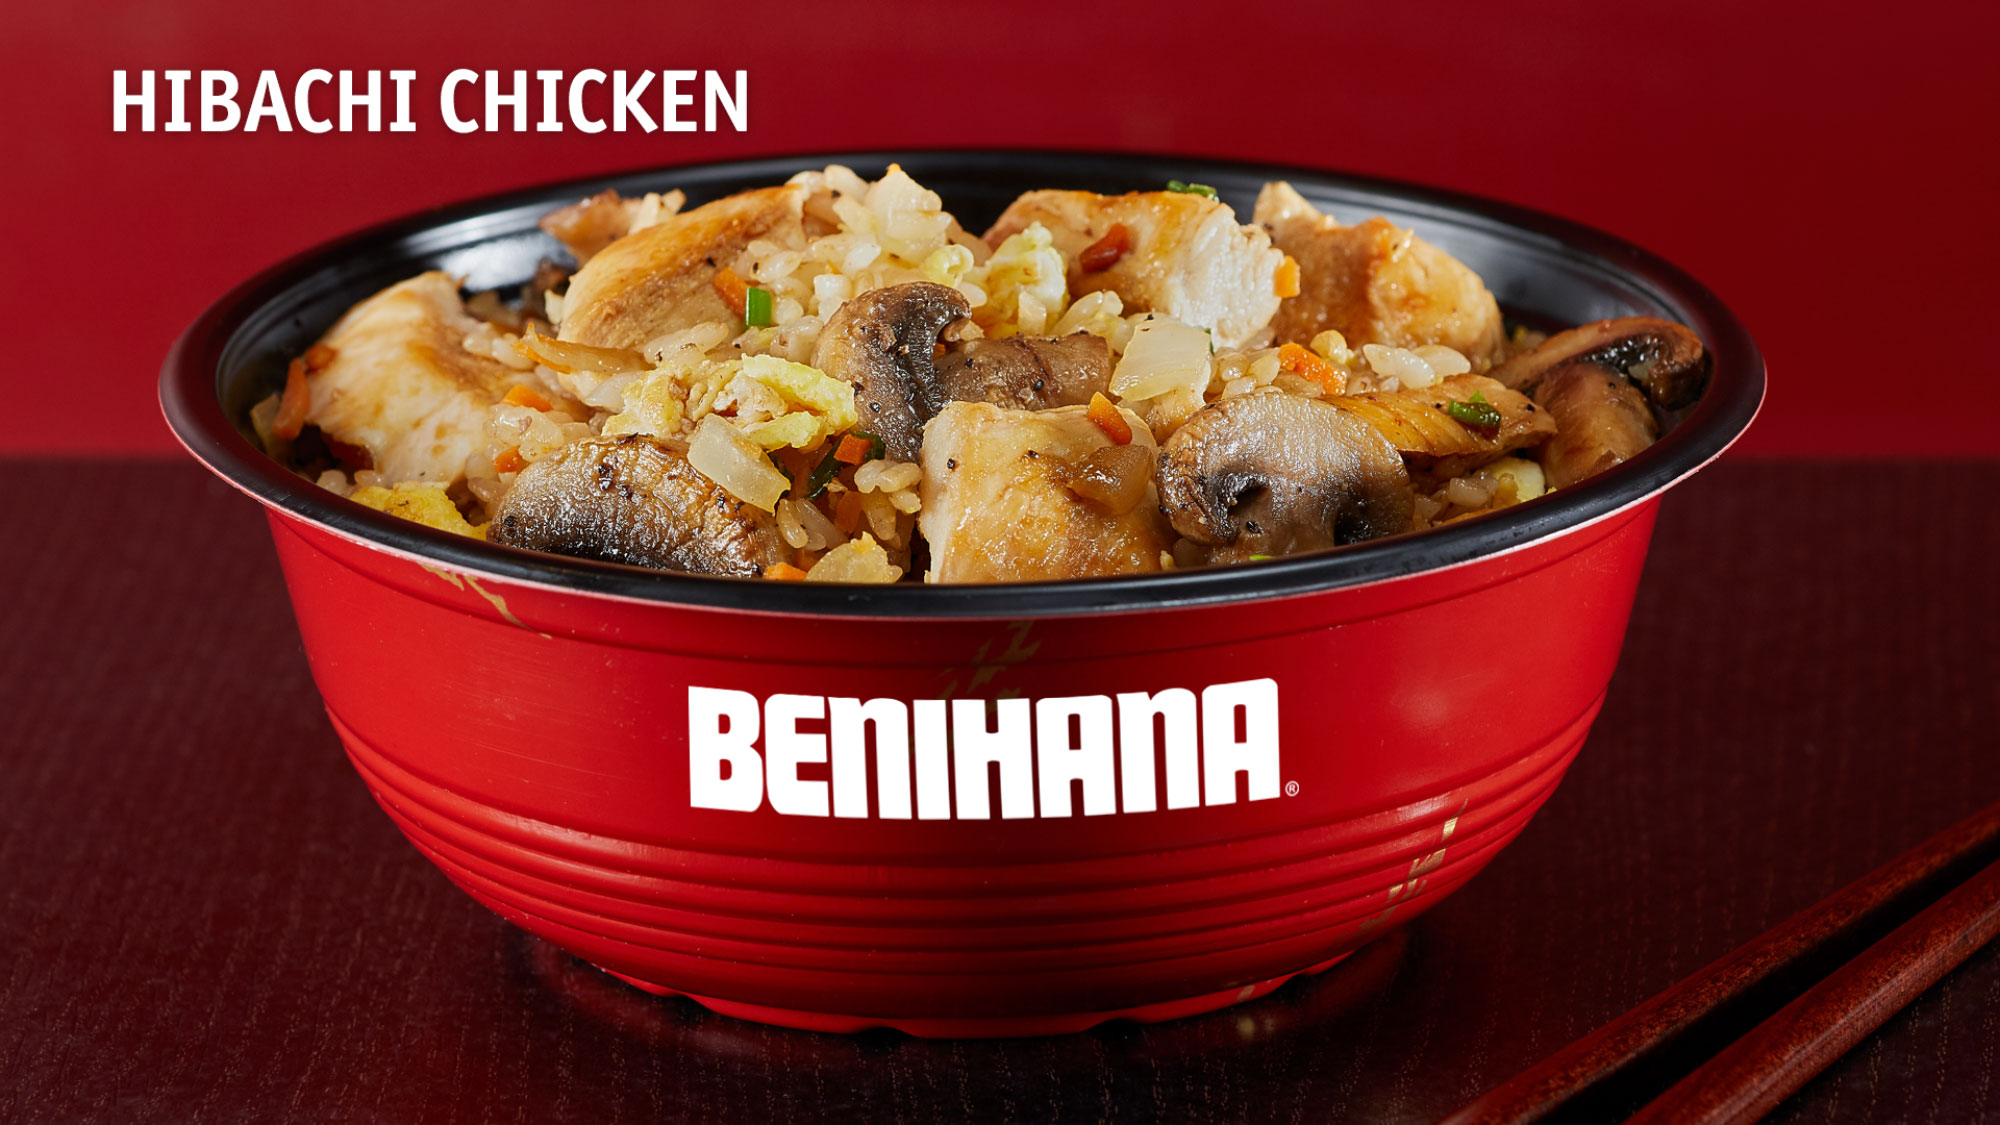 Hibachi Chicken Bowl